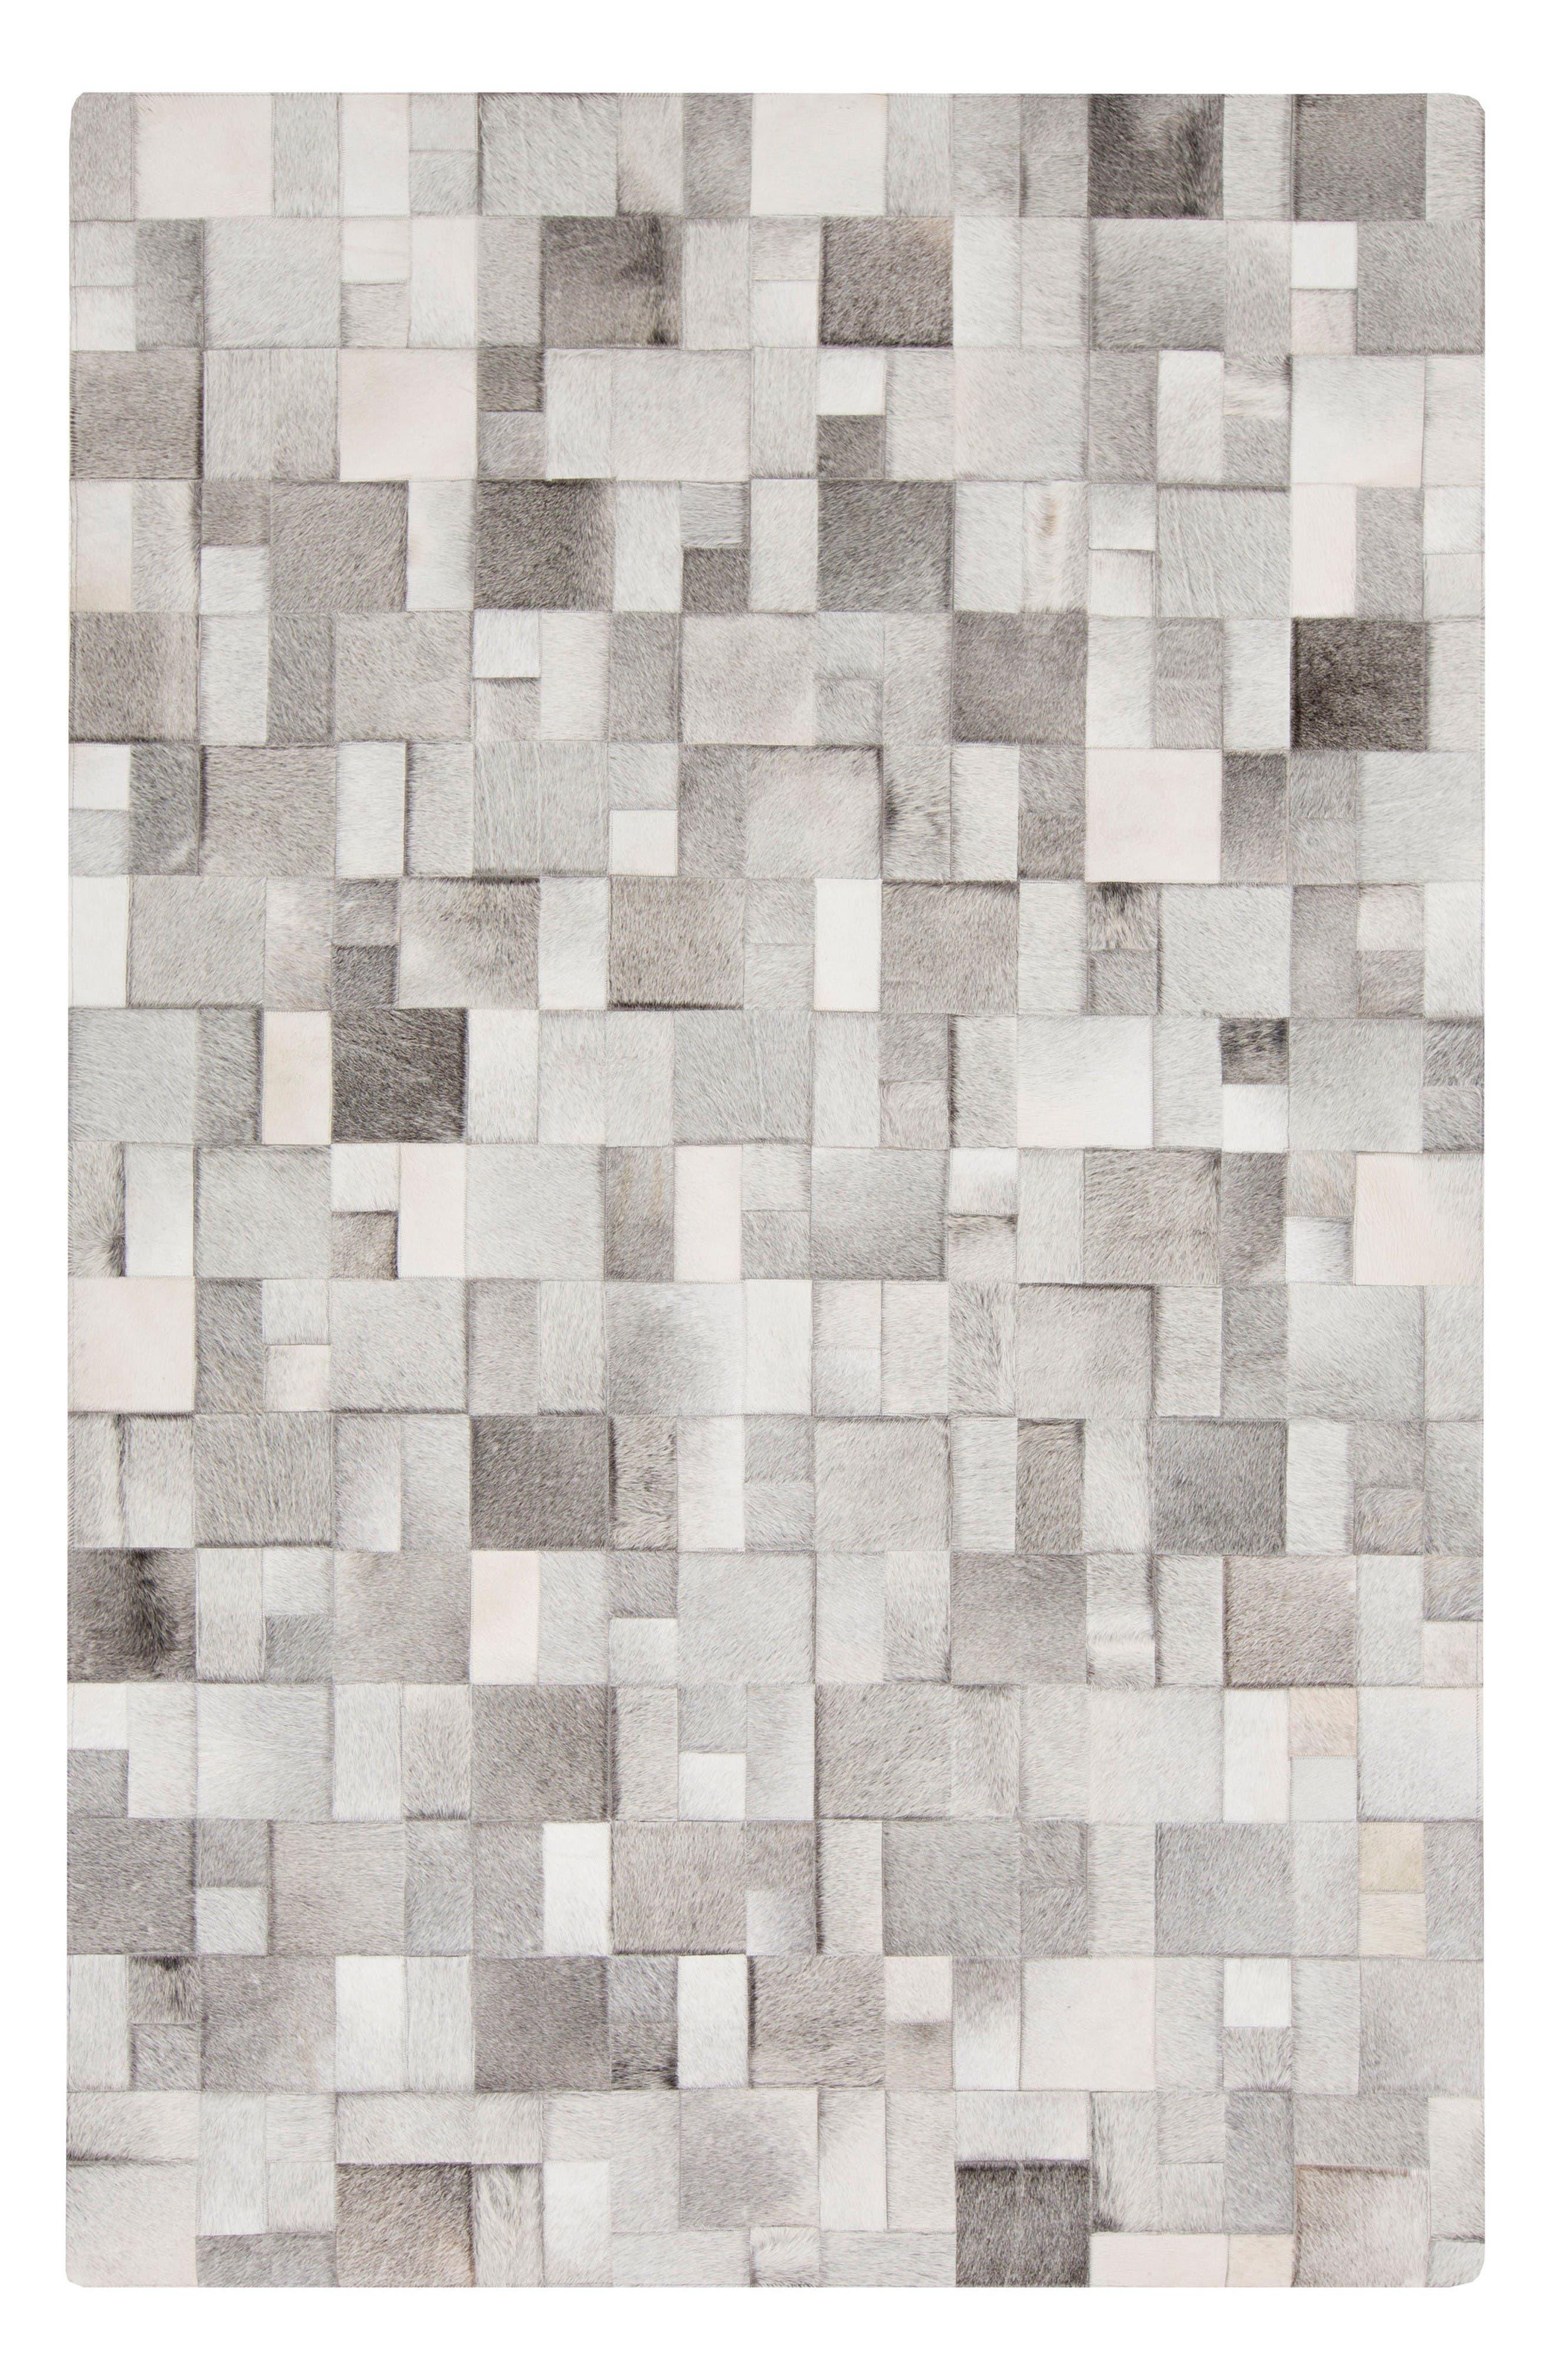 Outback Blurred Bricks Calf Hair Rug,                         Main,                         color, Grey